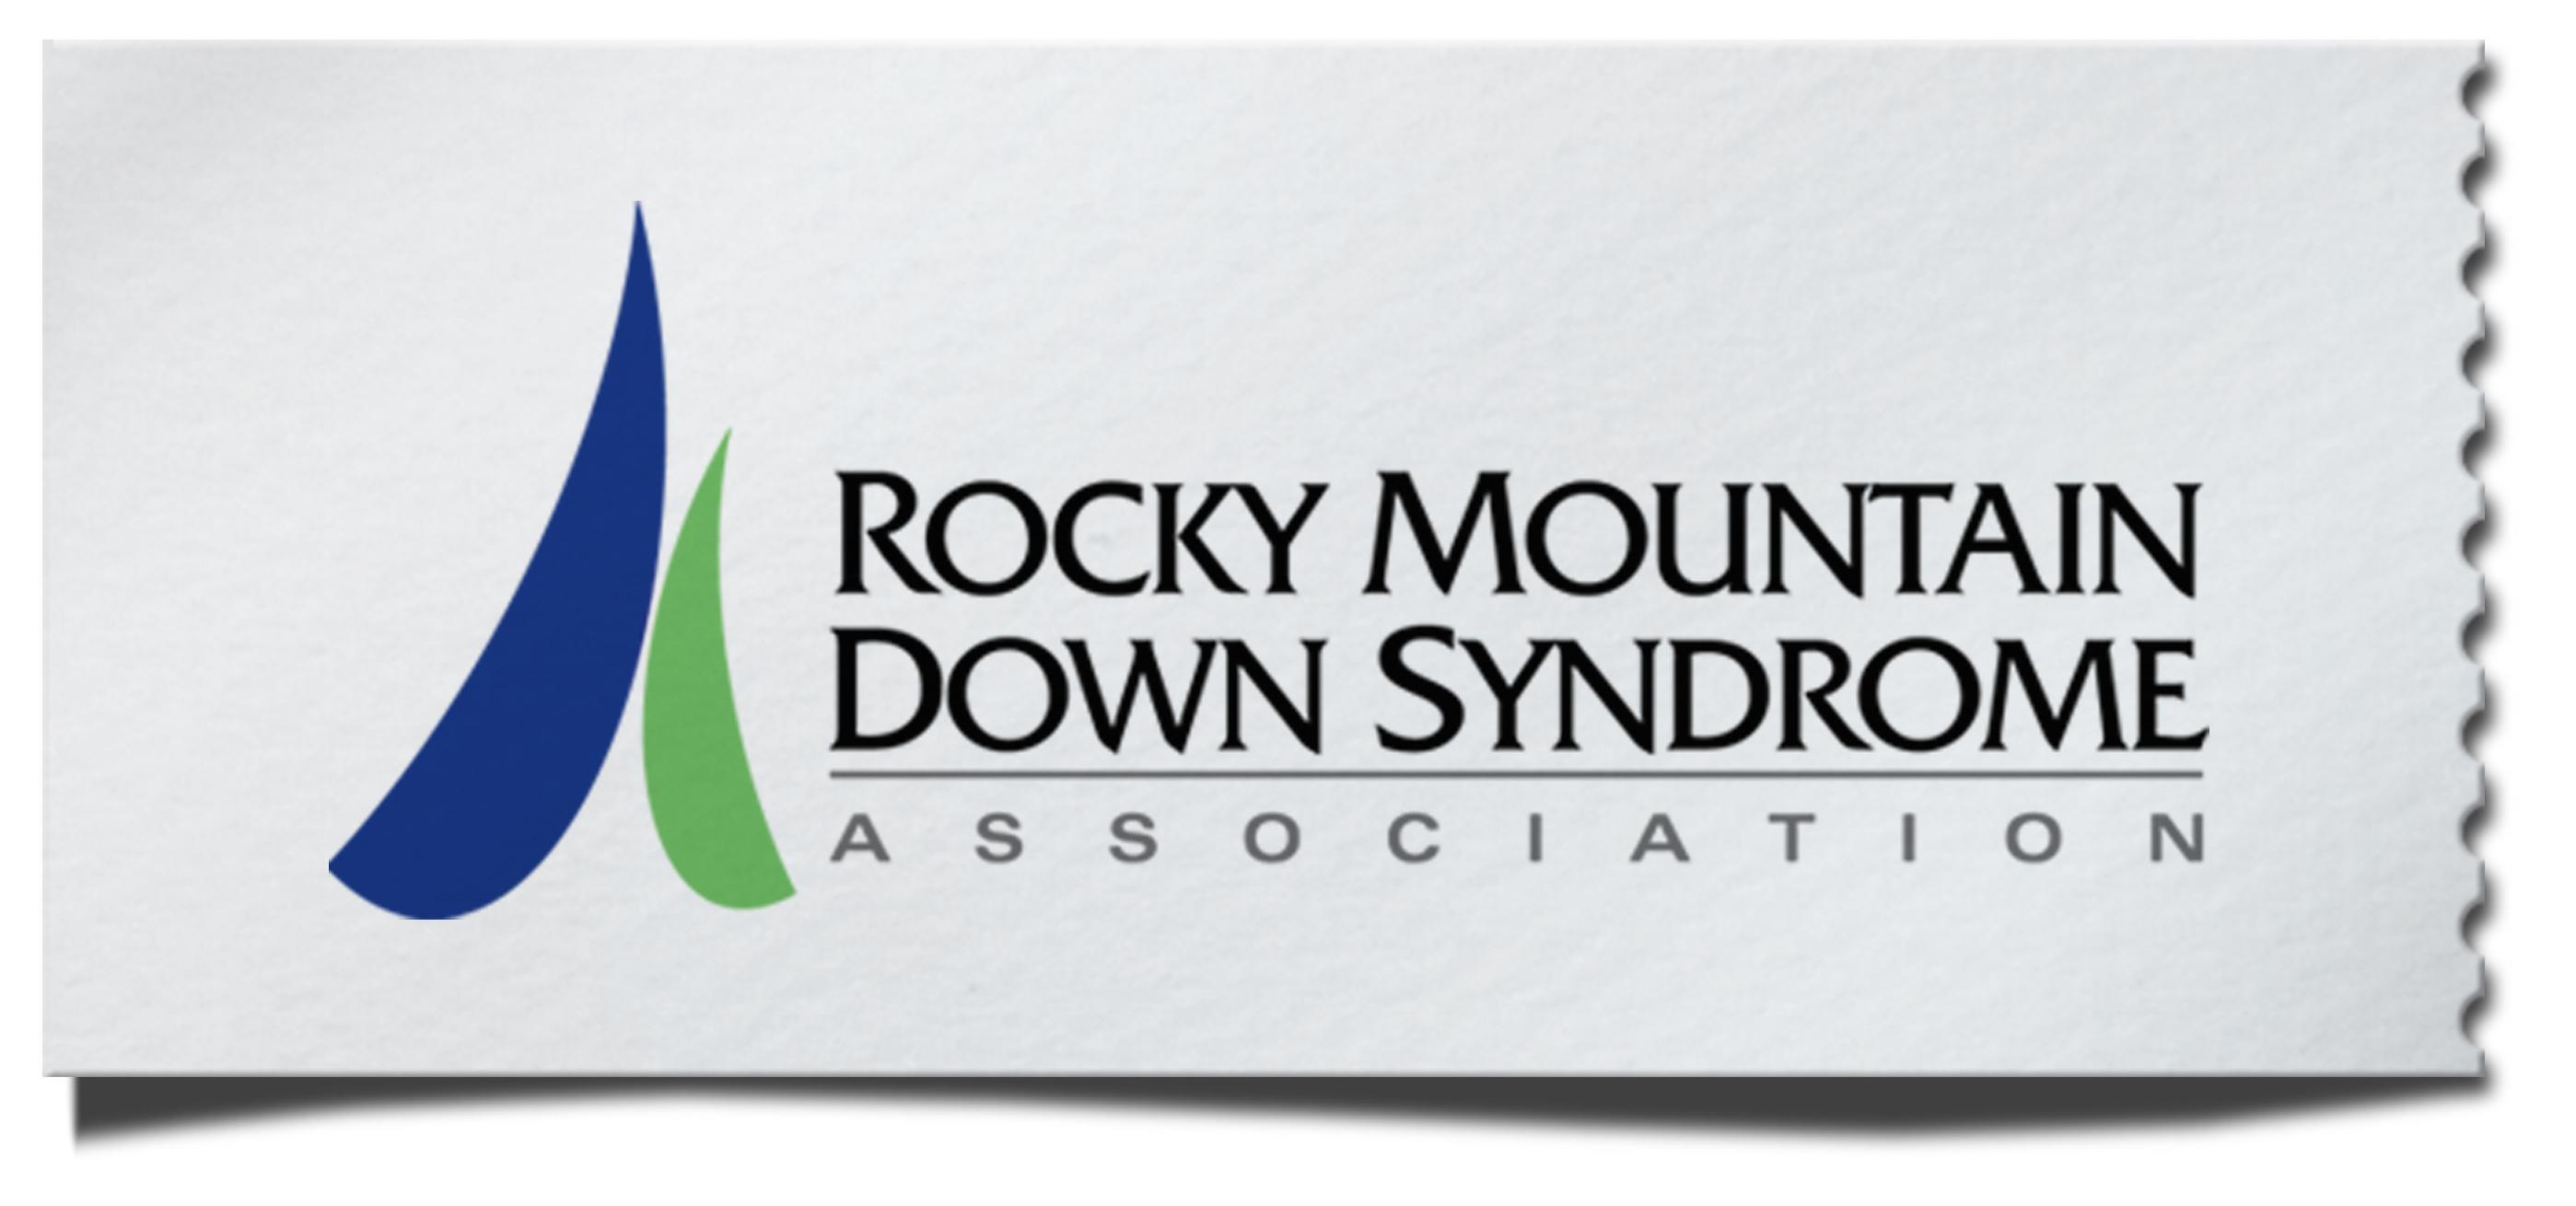 Rocky Mountain Down Syndrome Association